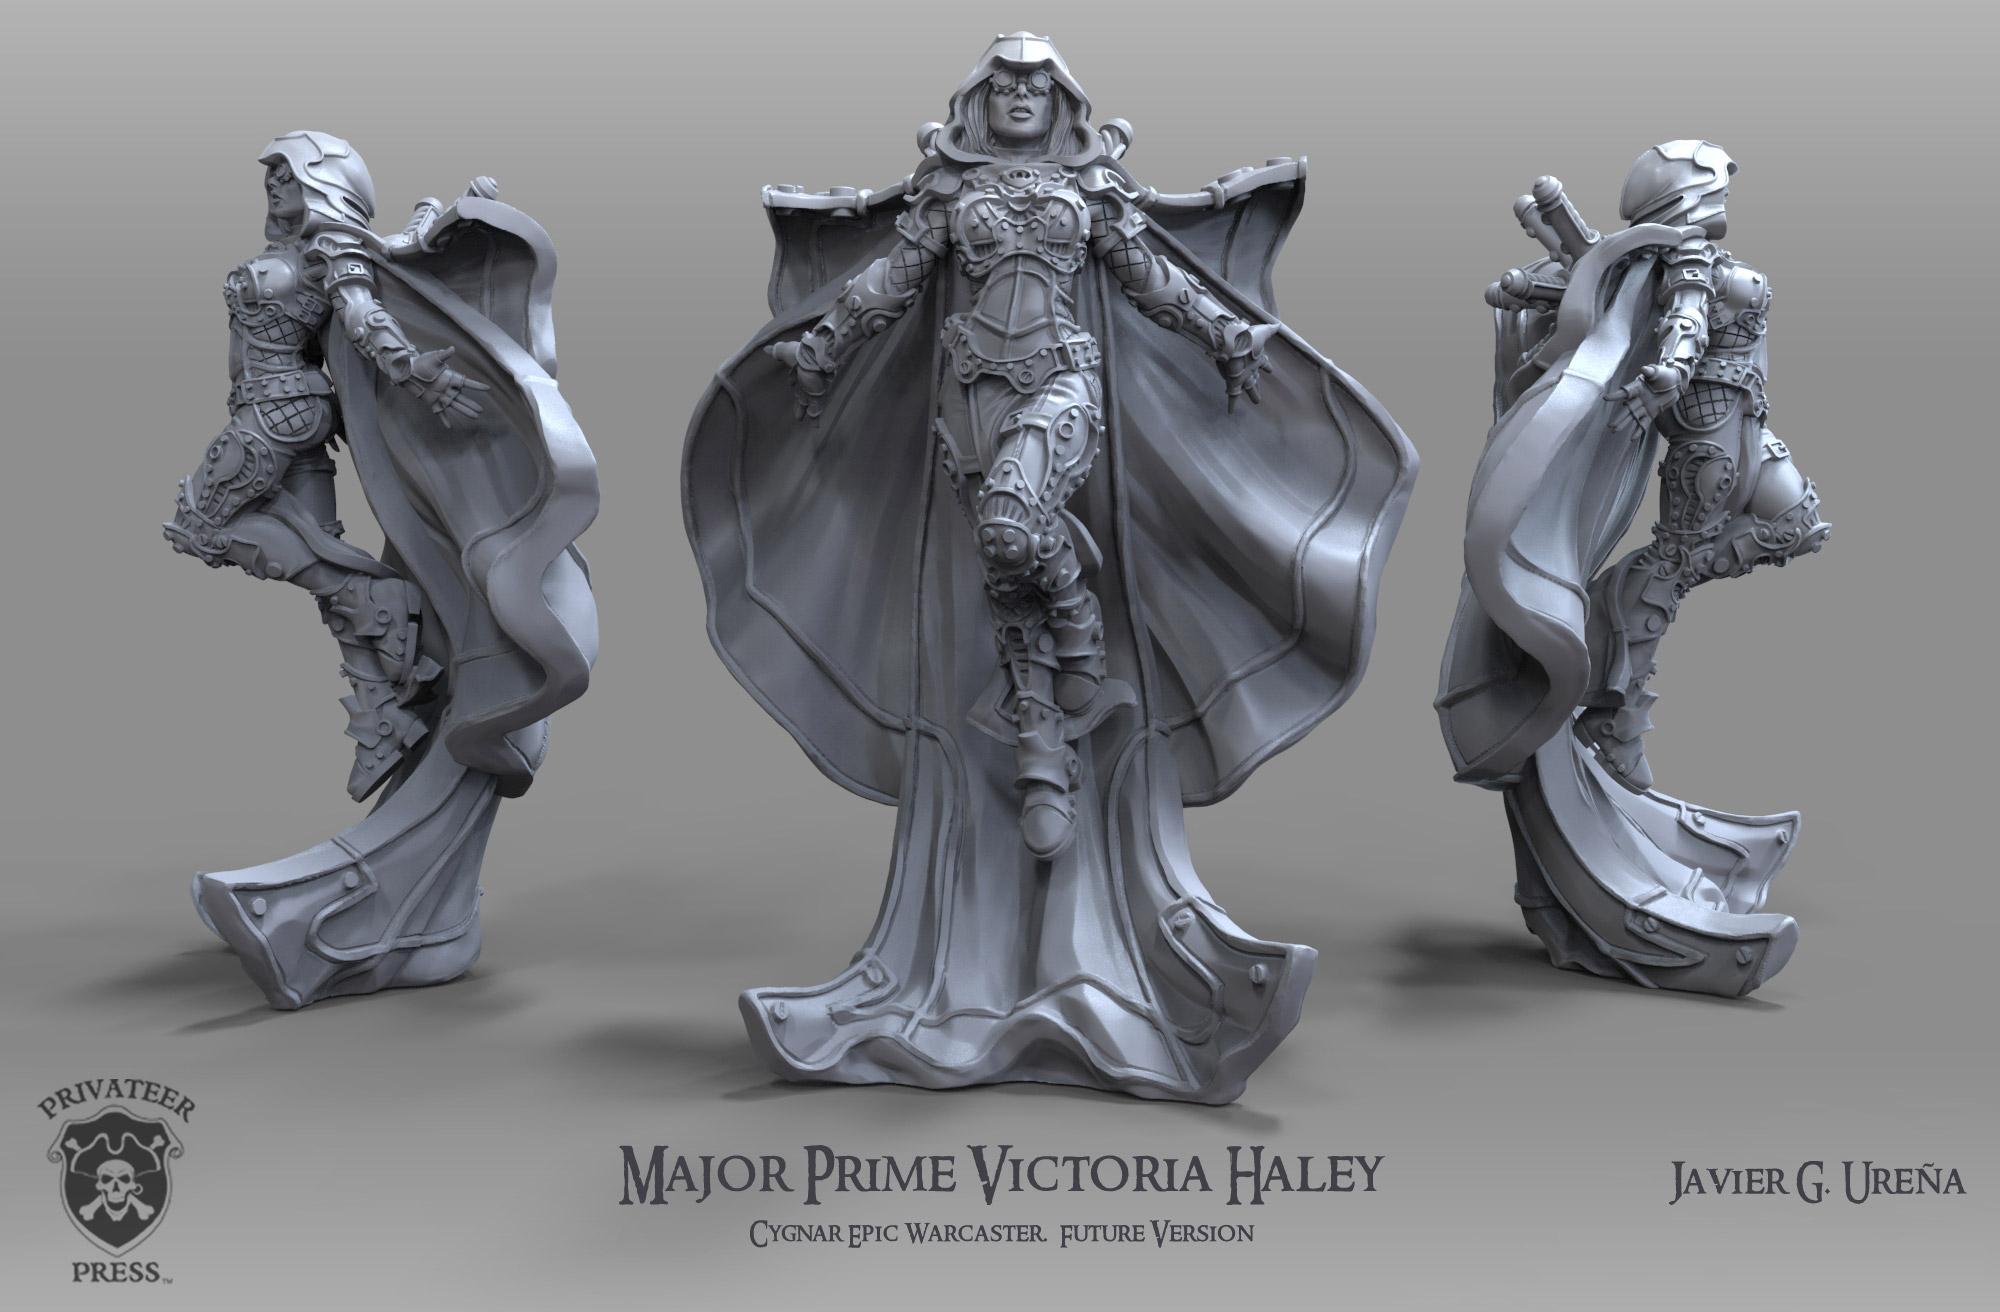 Major Prime Victoria Haley: Future Version